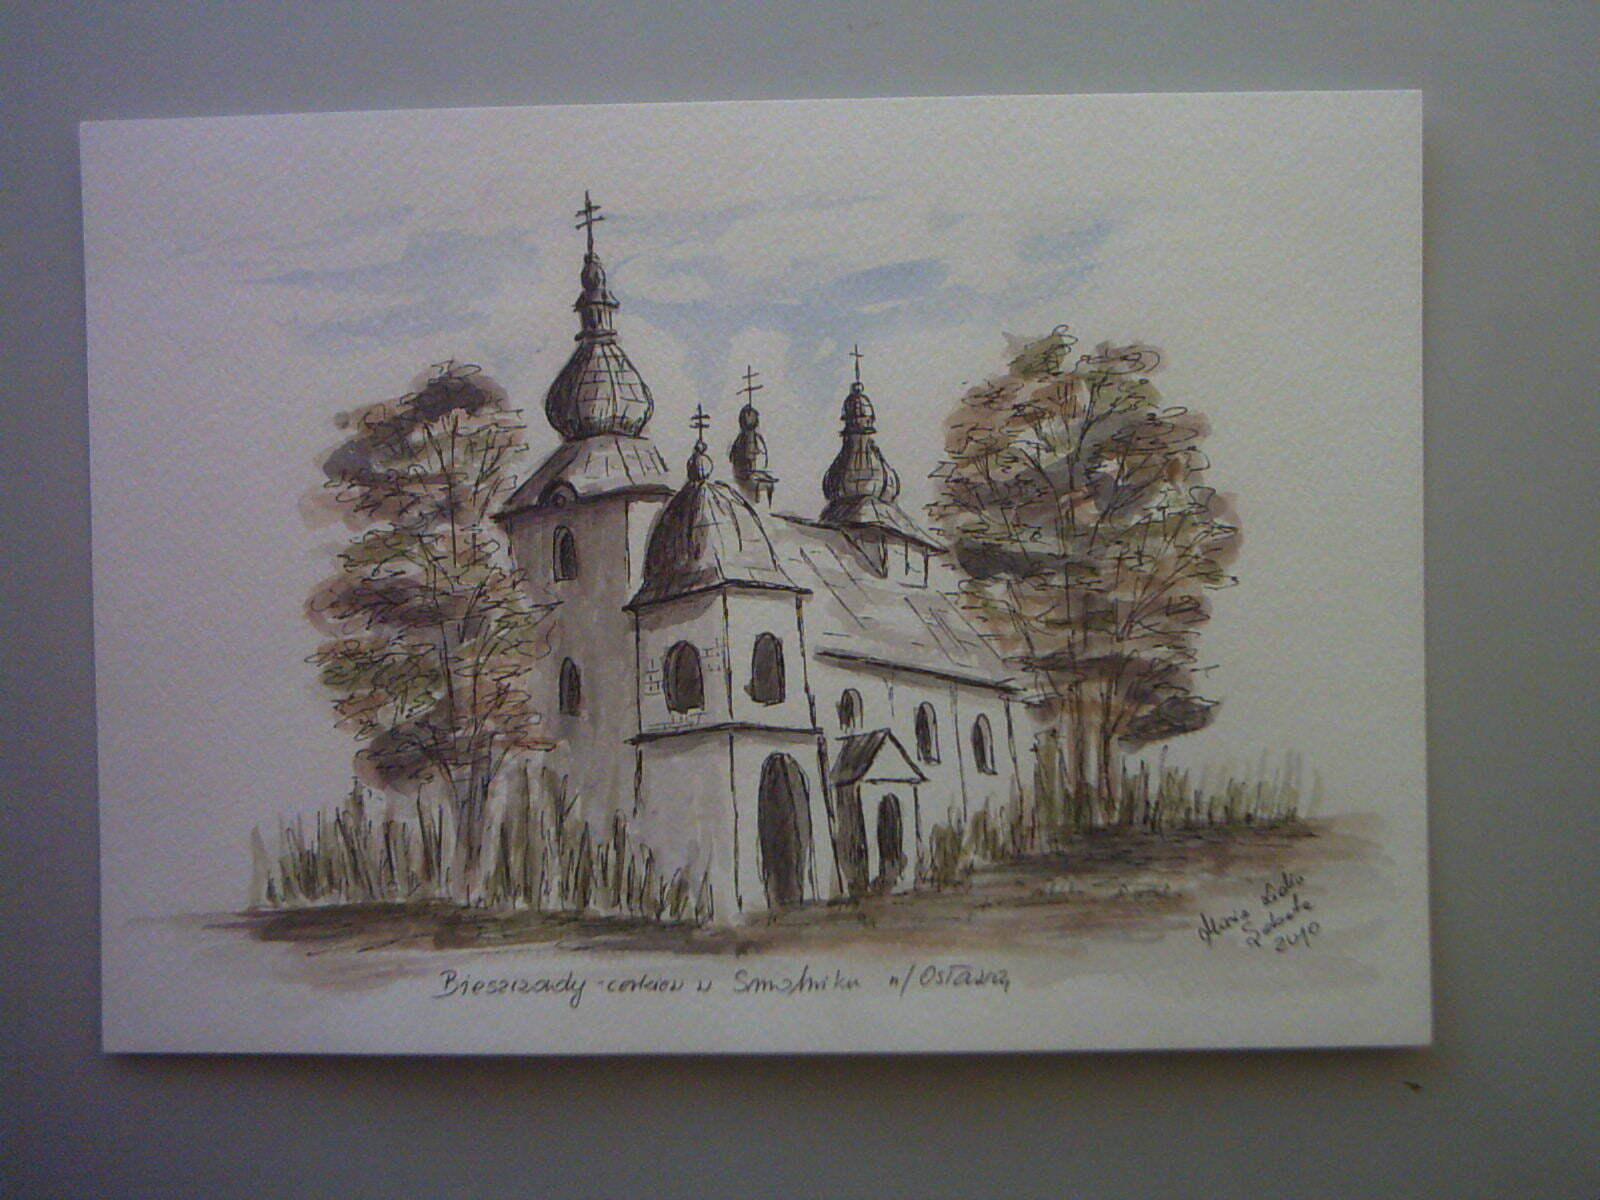 Obraz Marii Lidii Sobota / fot. Lidia Tul-Chmielewska